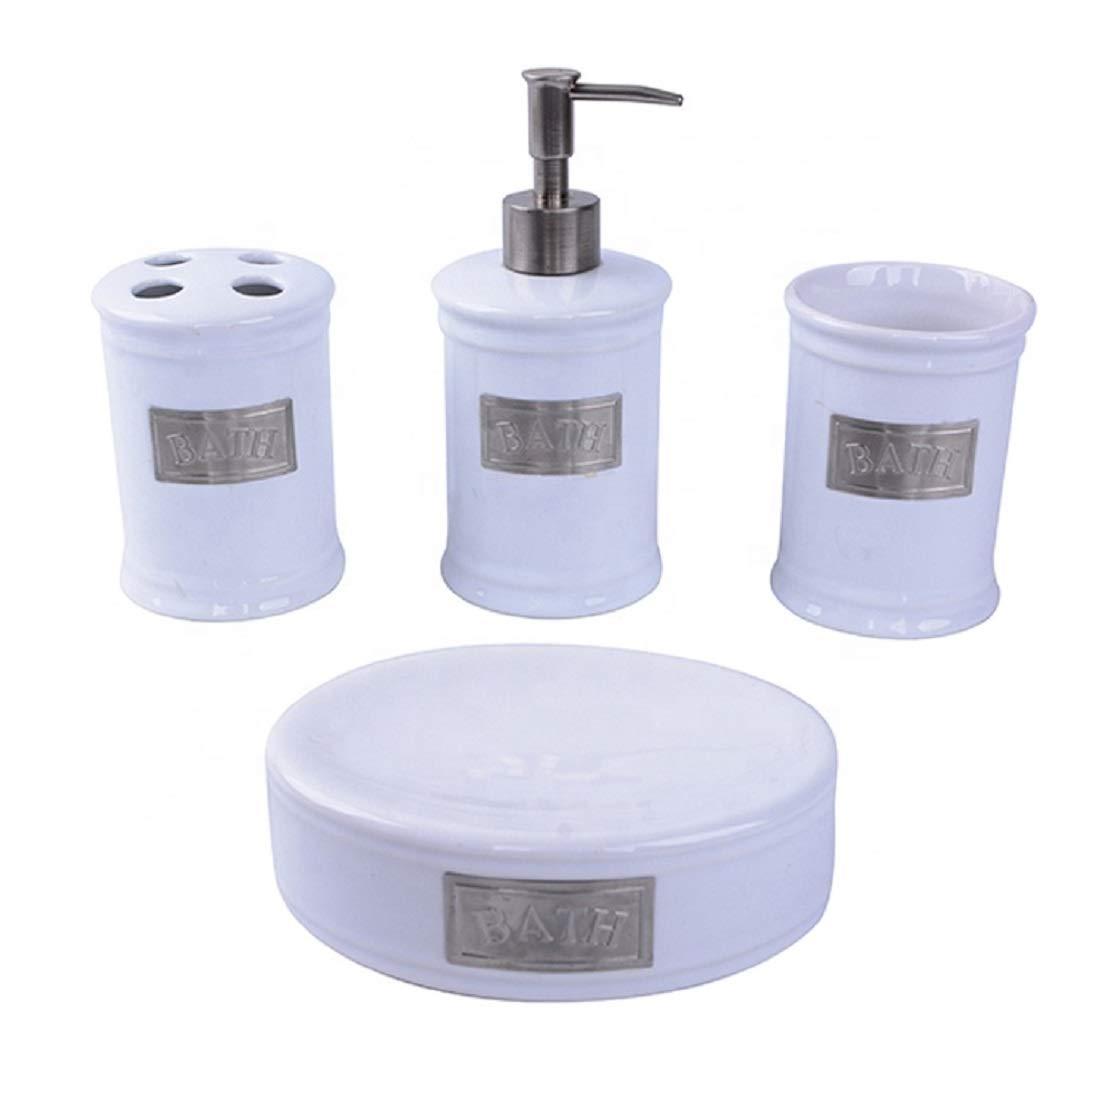 Contemporary Chrome Plated 4 Pcs White Ceramic Modern Bathroom Accessories